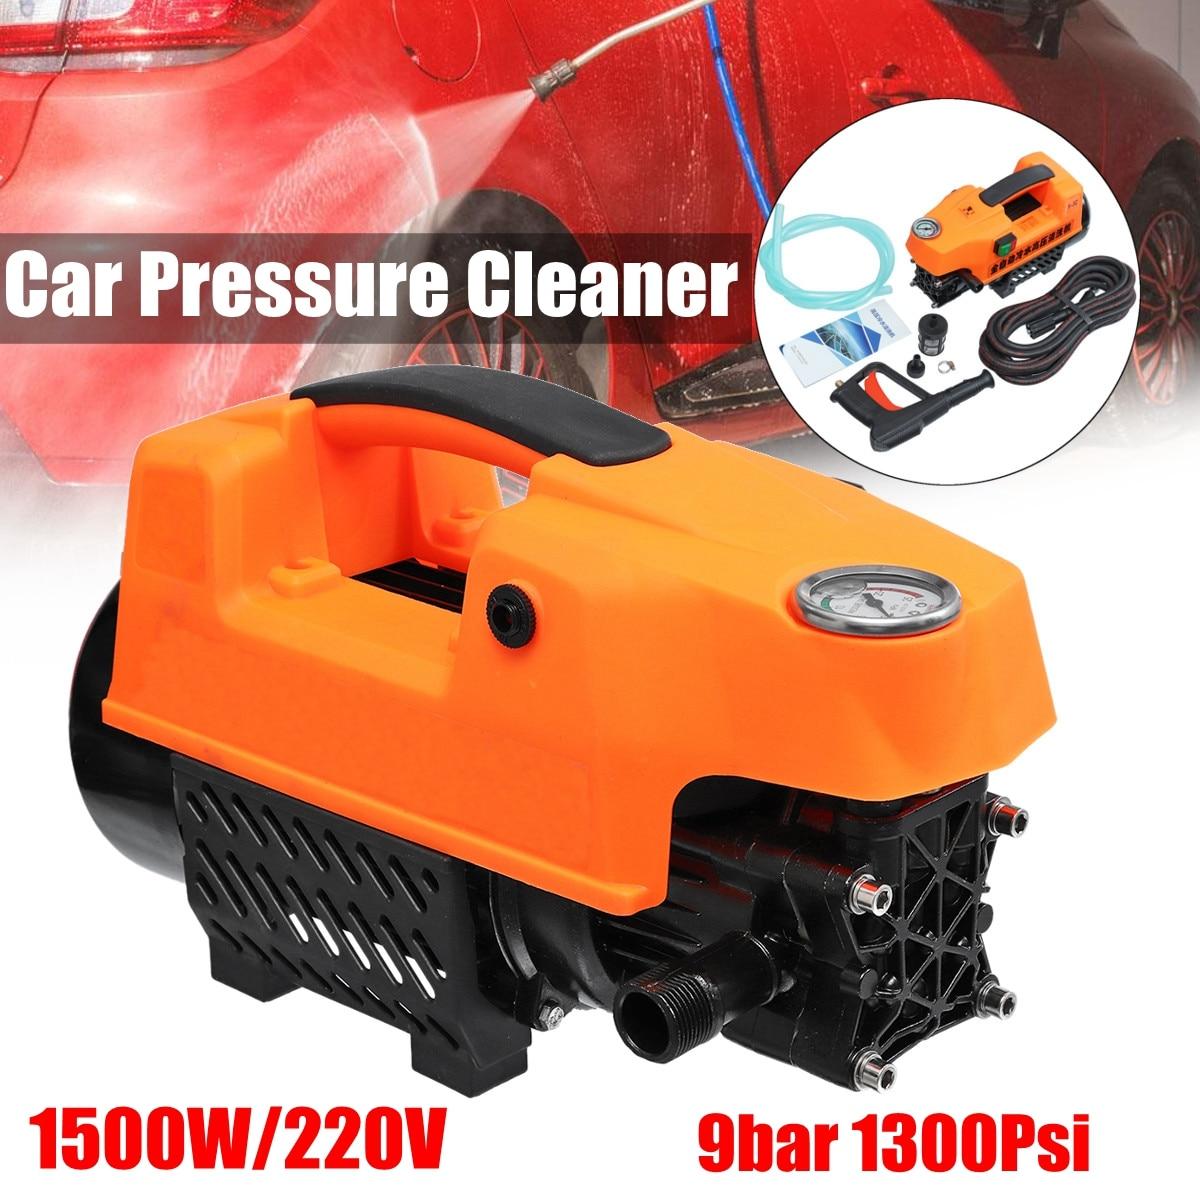 High Pressure Washer 1500W Portable Electric Car High Pressure Washing Cleaner Machine 220V 1300Psi Portable Car Washer